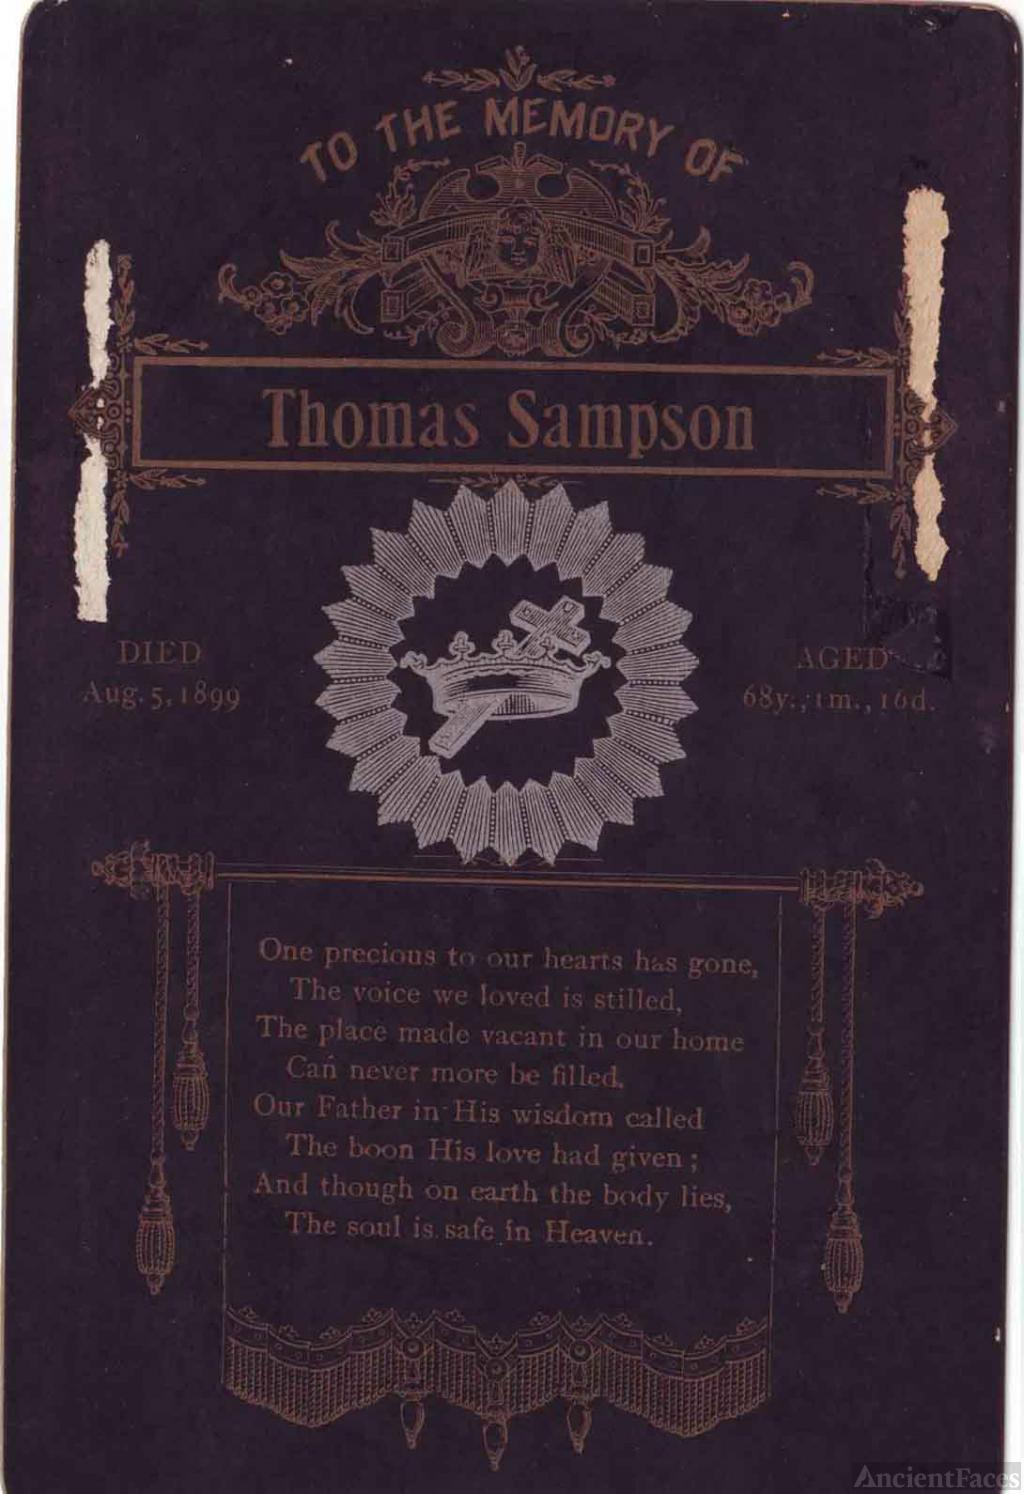 Thomas Sampson funeral card